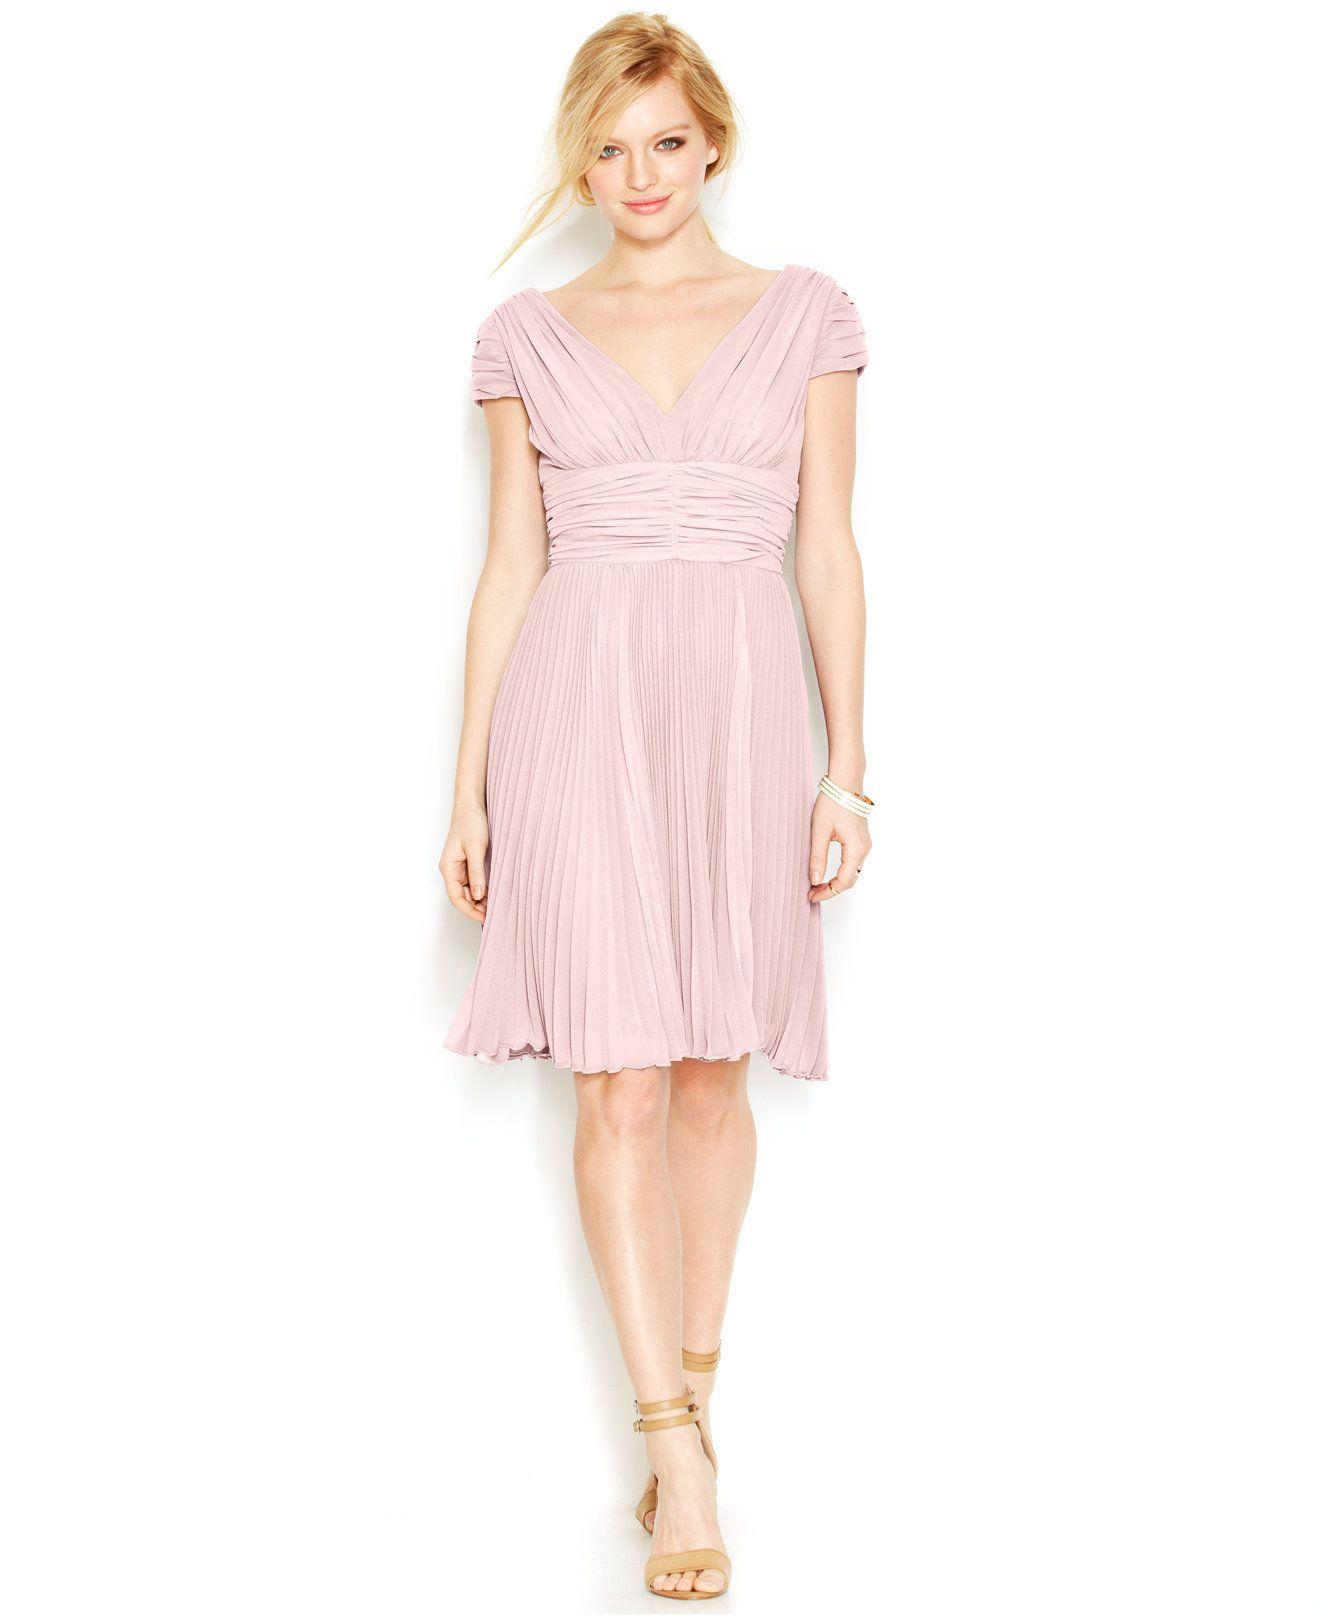 macys wedding guest dresses Betsey Johnson Cap Sleeve Ruched Pleated Dress Dresses Women Macy s